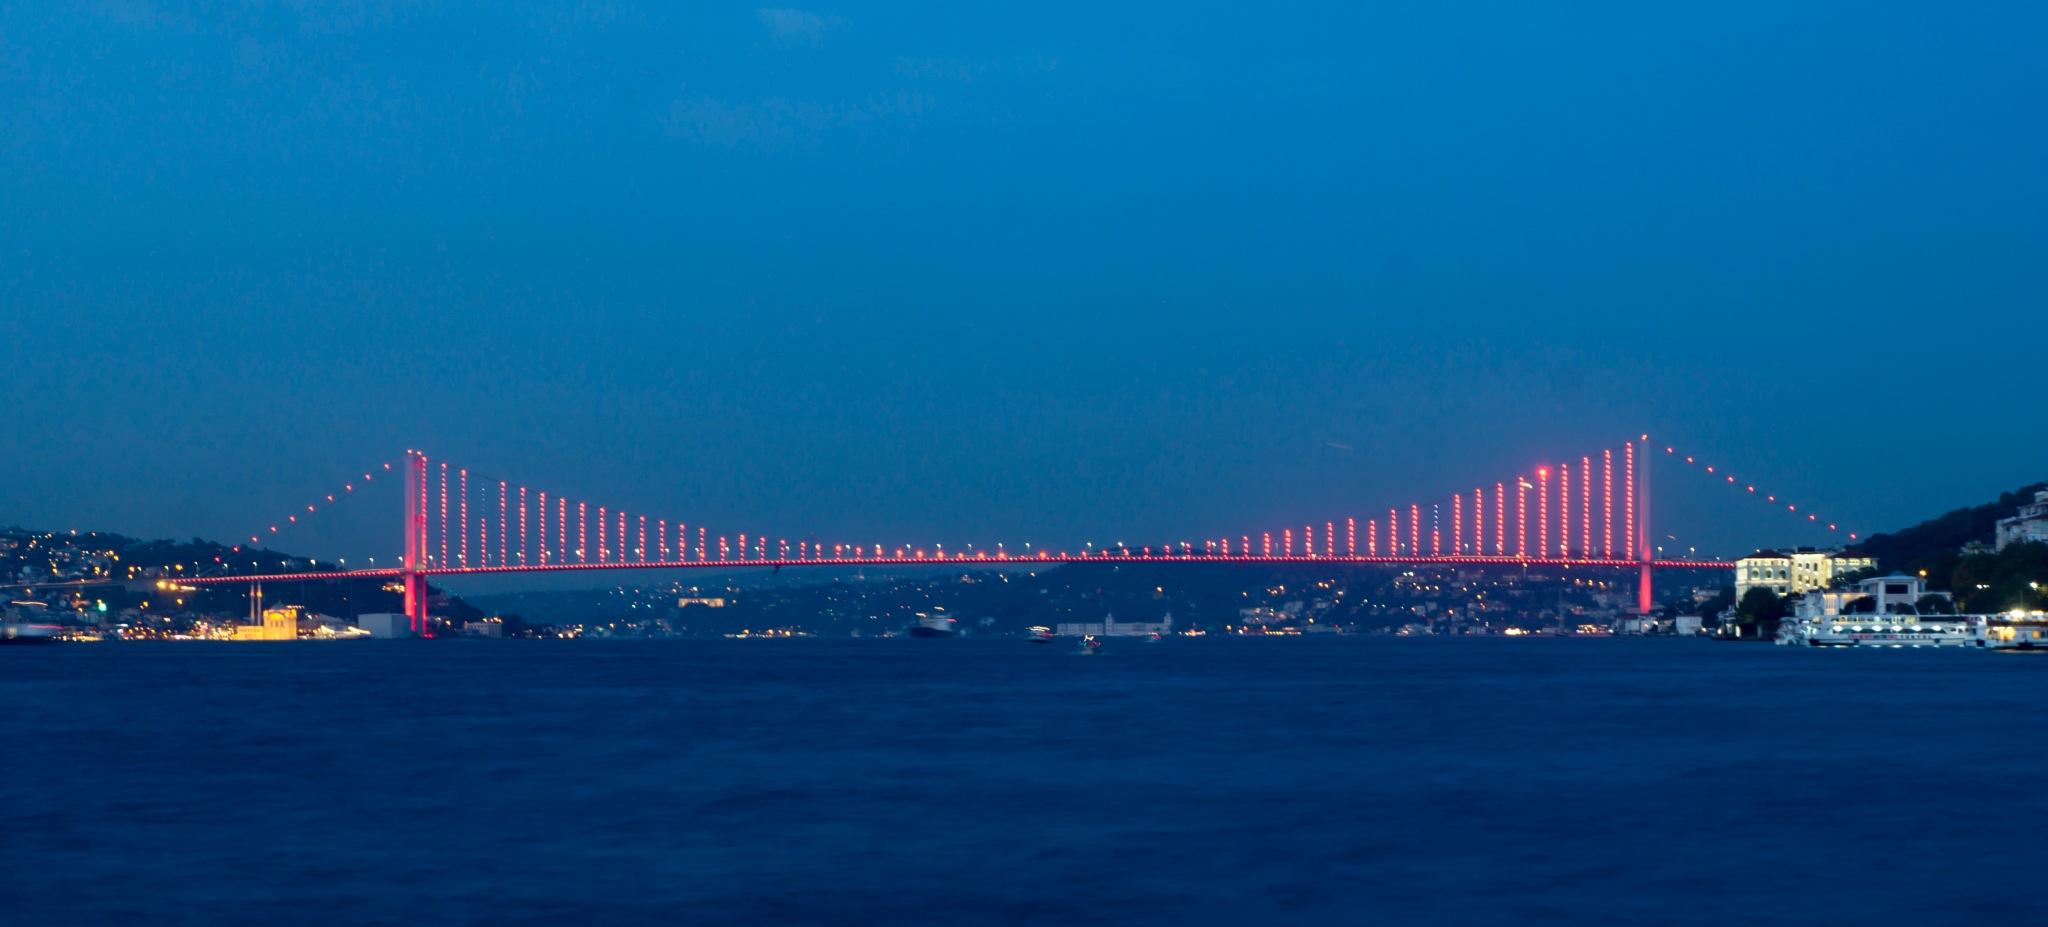 Bosphorus Bridge by lizardofthewisard